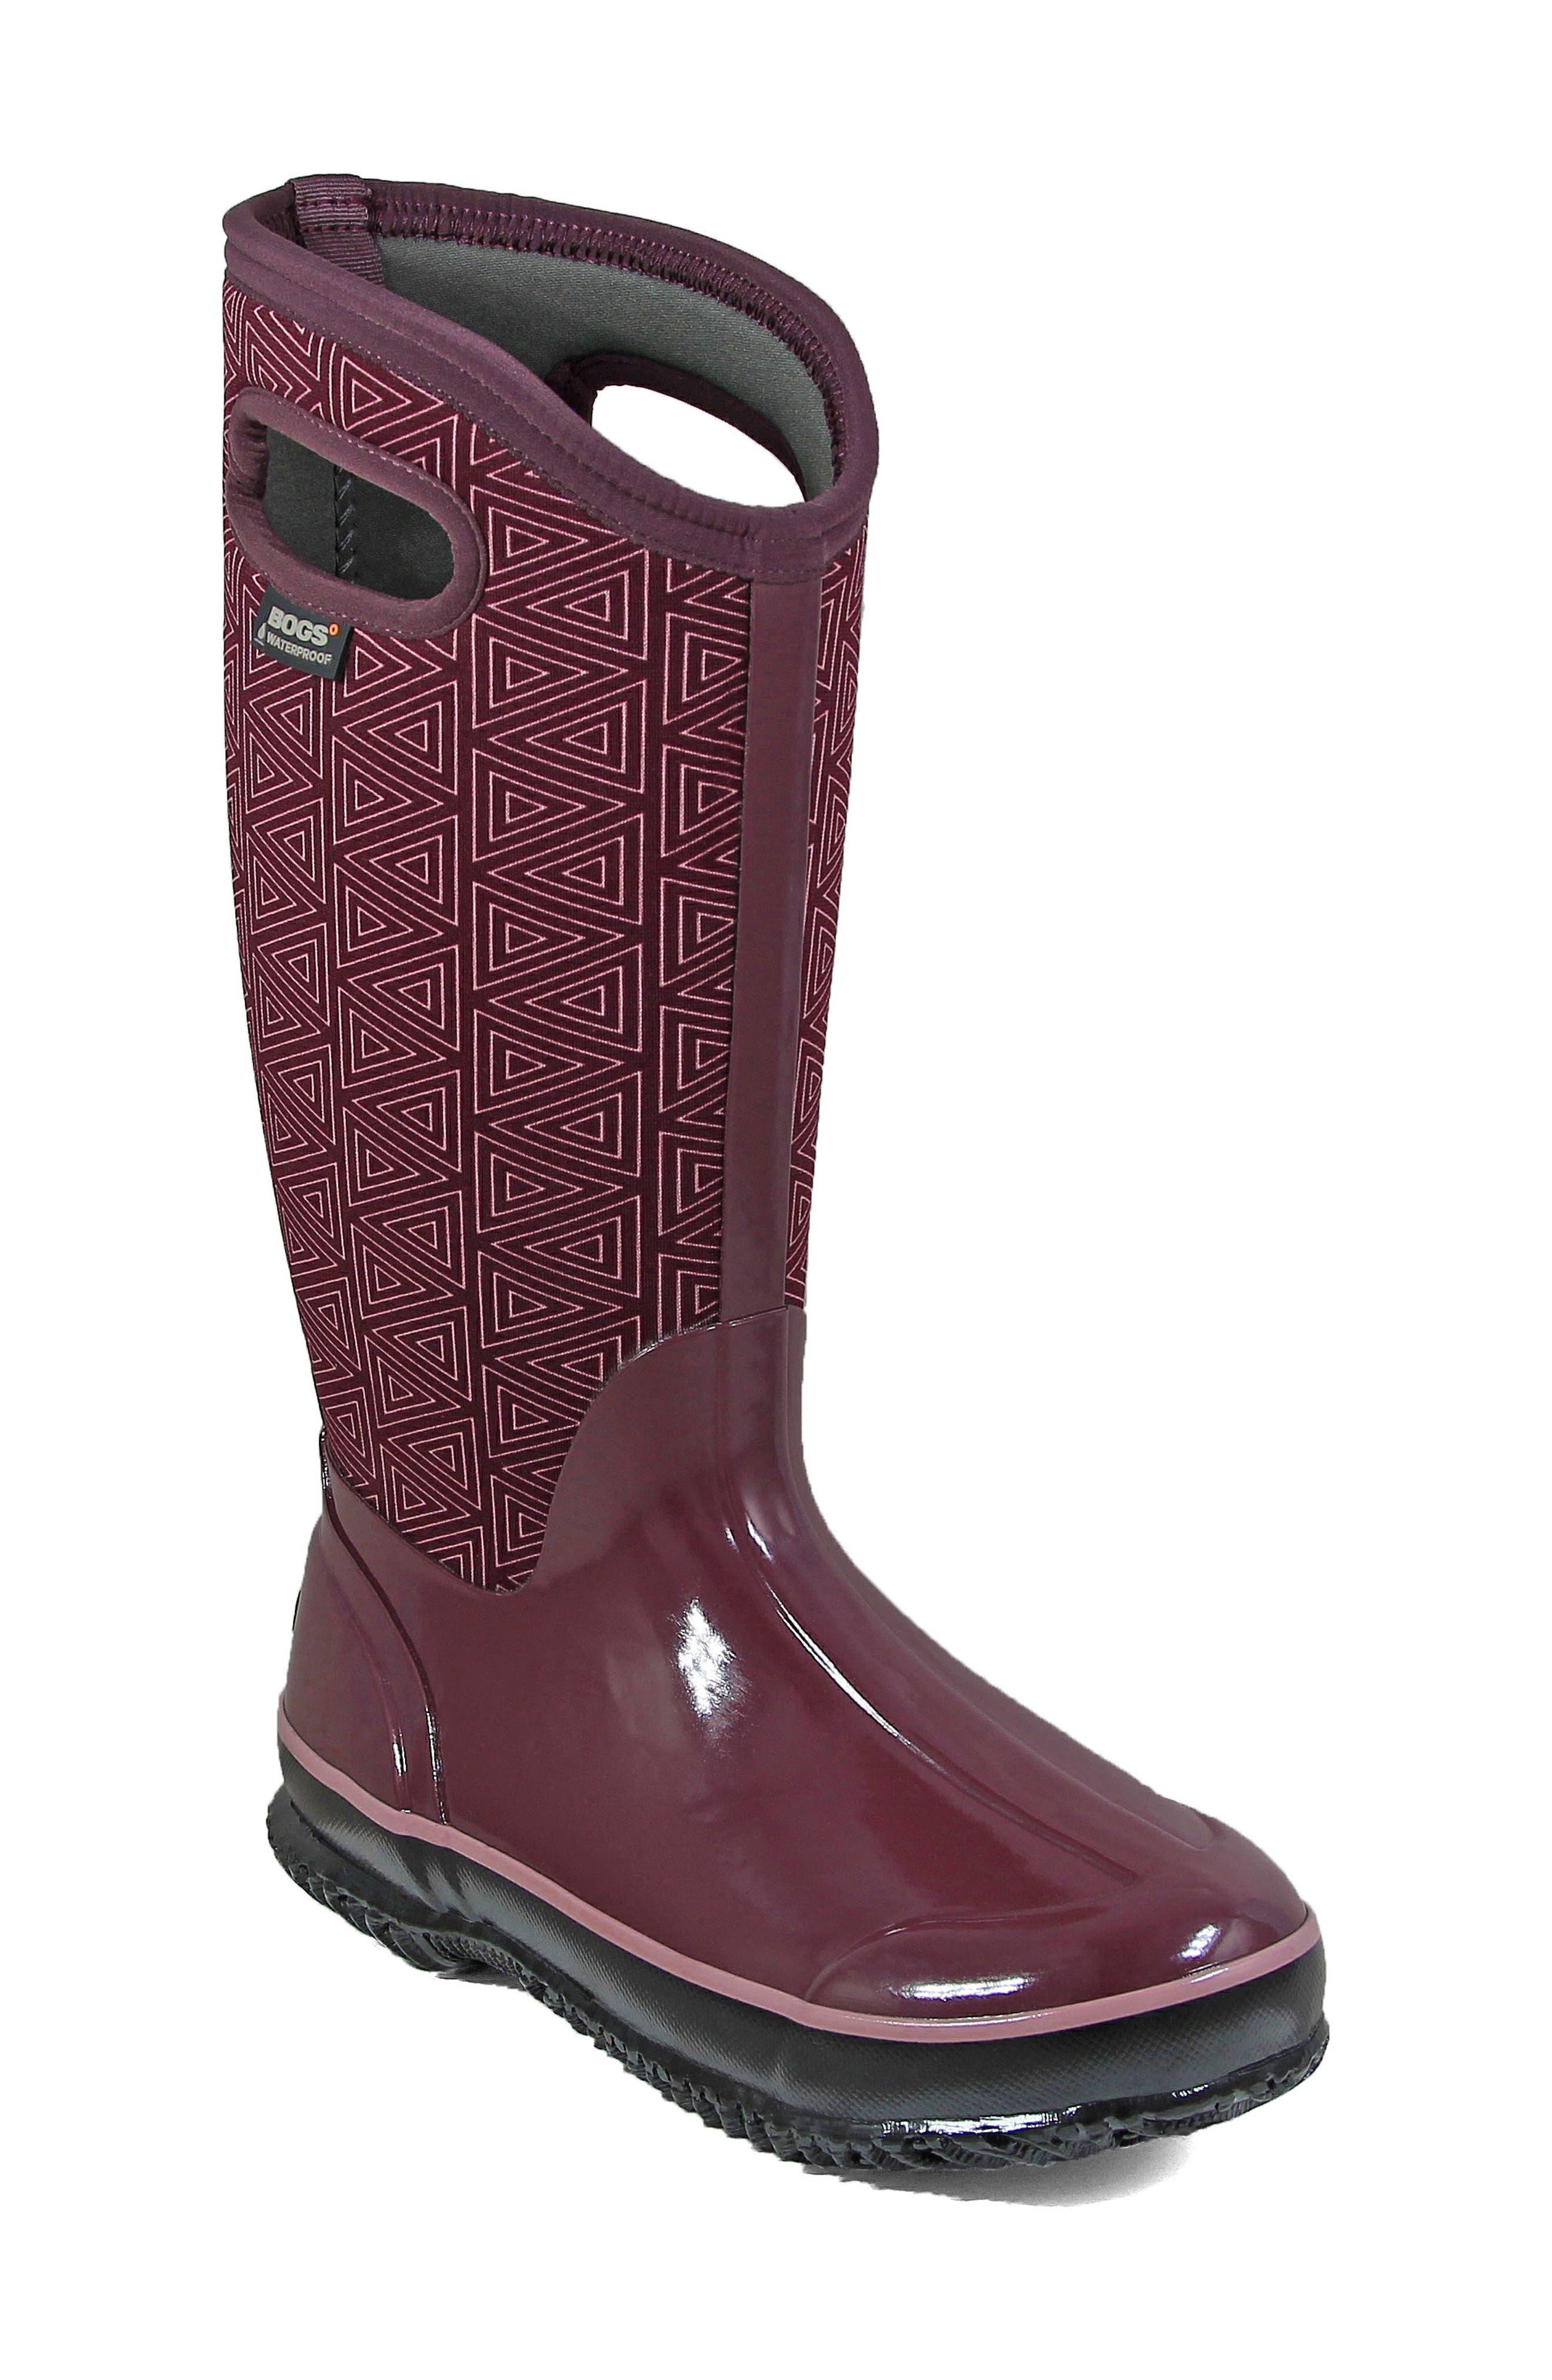 Main Image - Bogs Classic Triangles Waterproof Subzero Insulated Boot (Women)